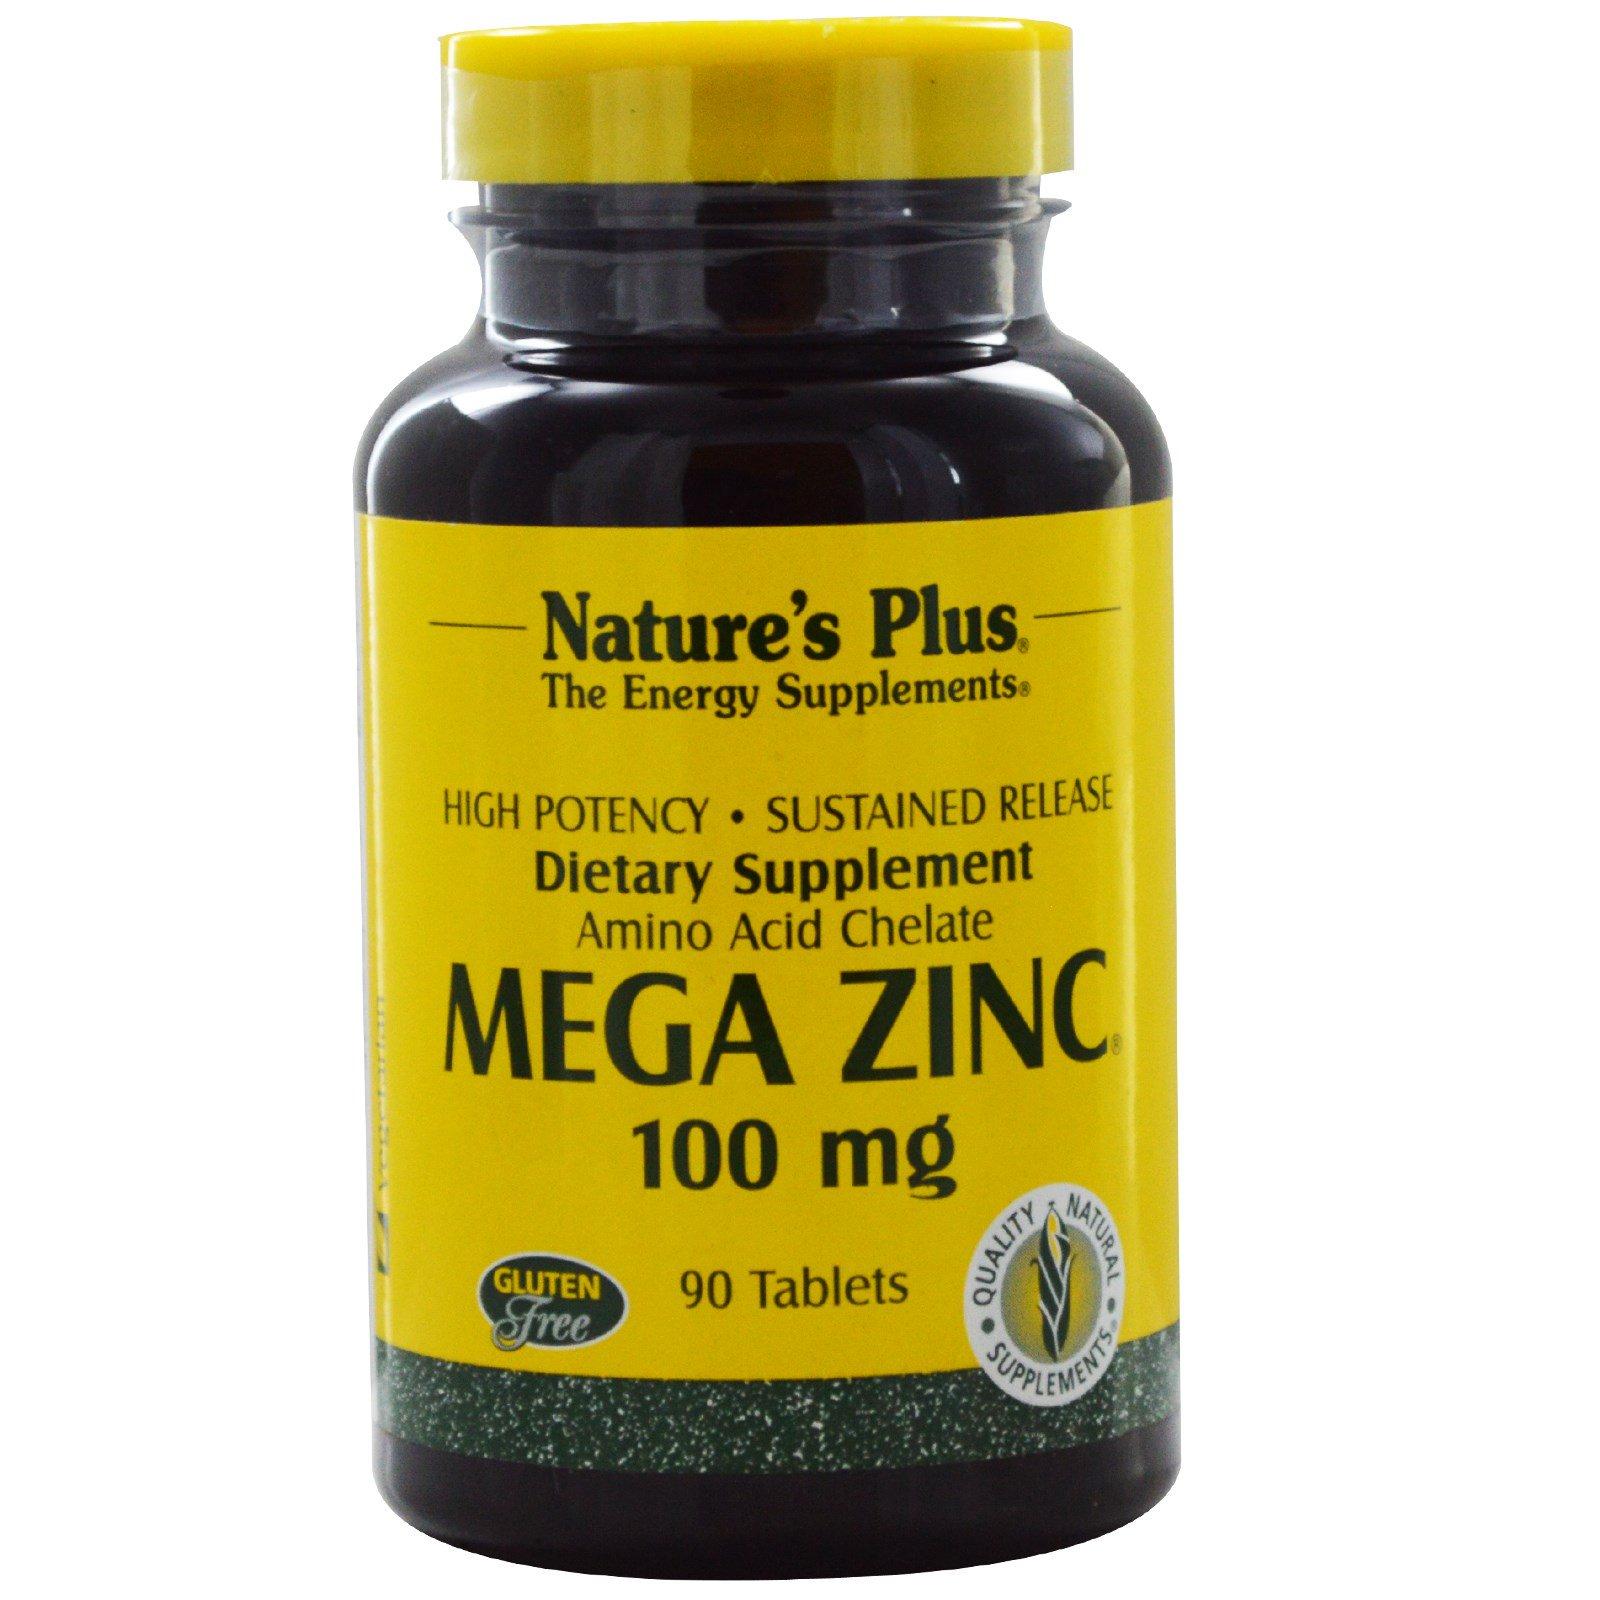 Nature's Plus, Мега цинк, 100 мг, 90 таблеток